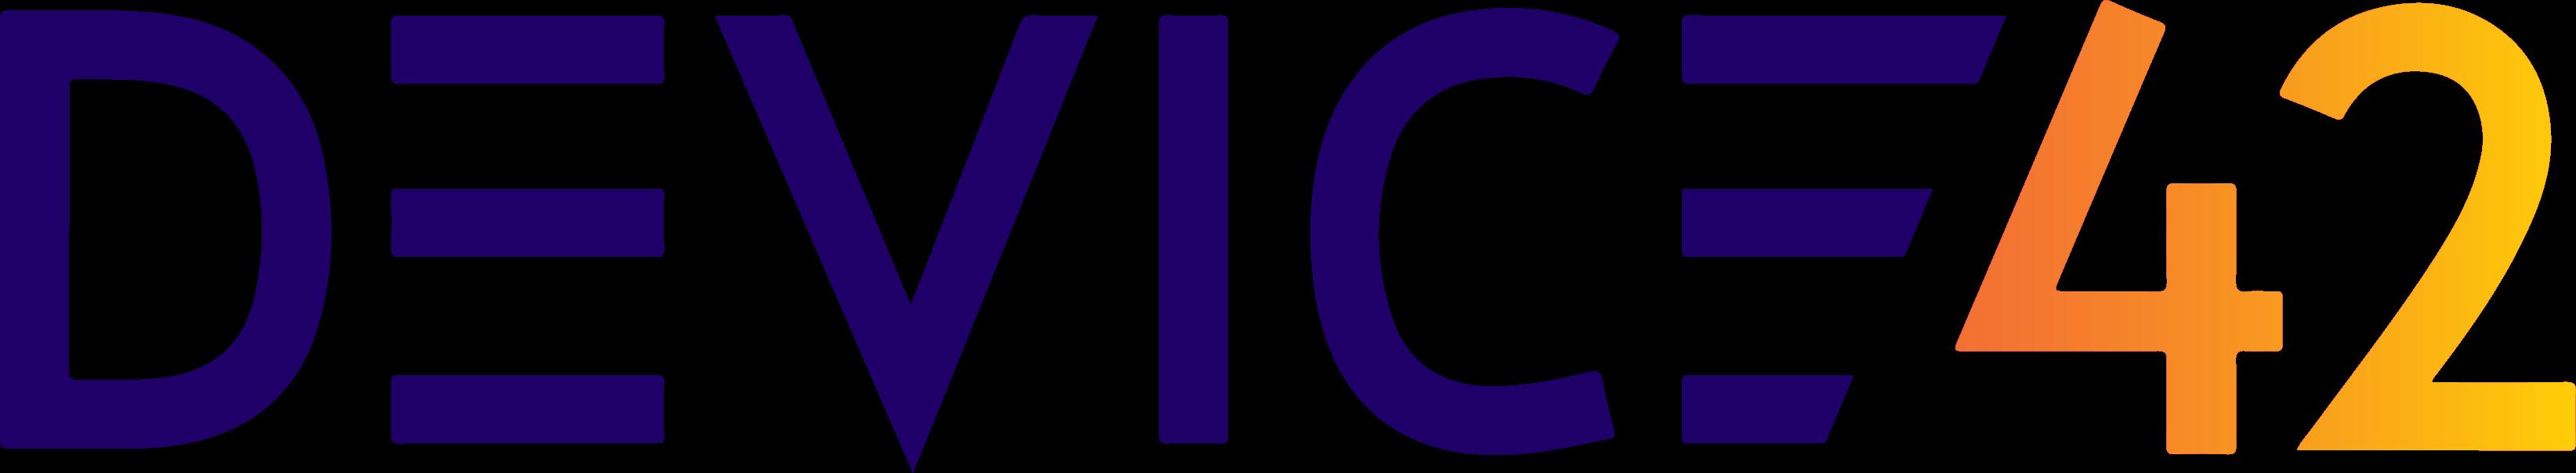 device42-logo